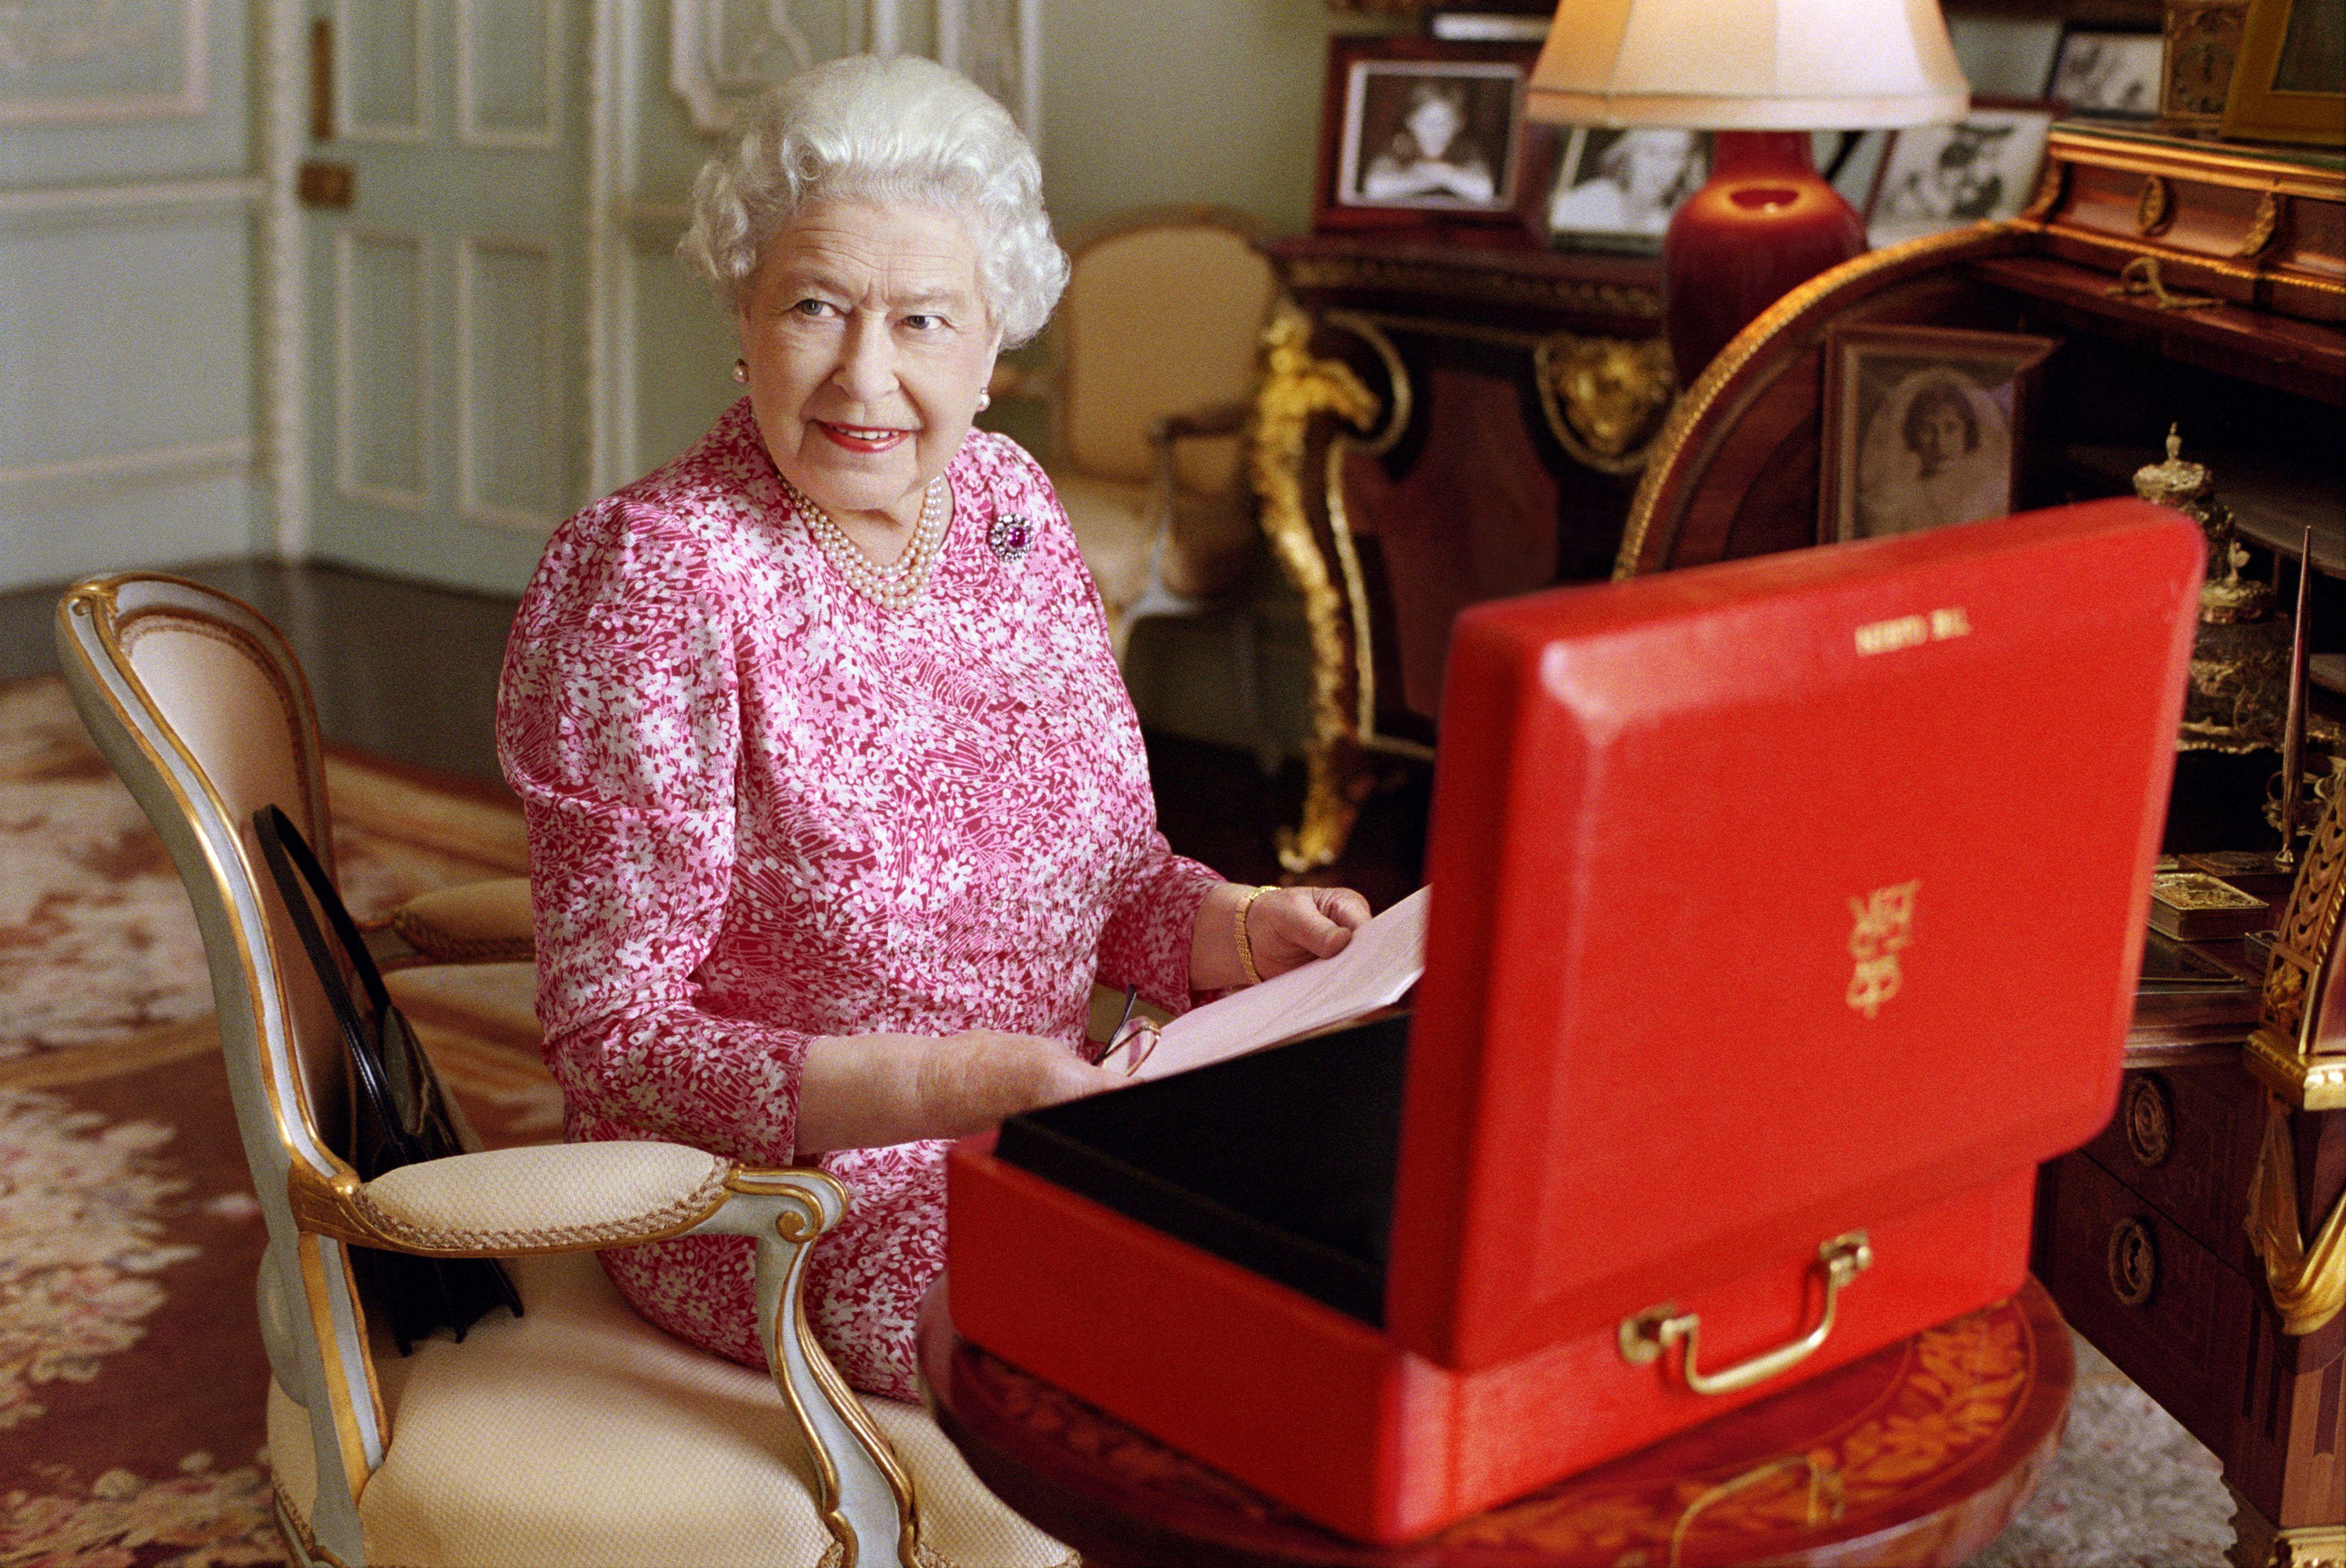 queen elizabeth ii s new official portrait elizabeth becomes longest reigning monarch elizabeth becomes longest reigning monarch